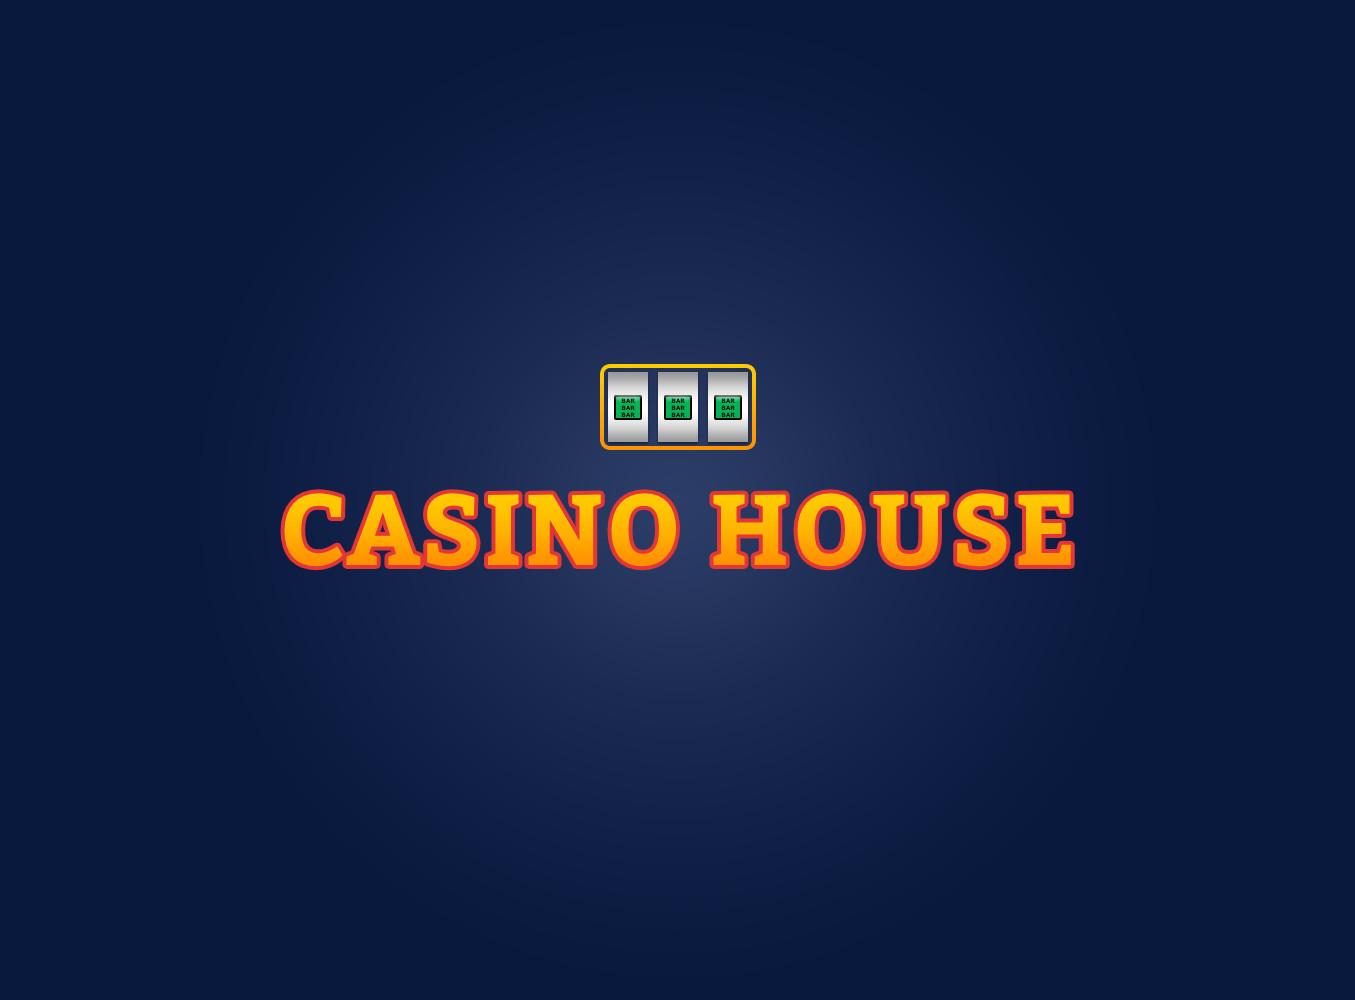 Casino House image